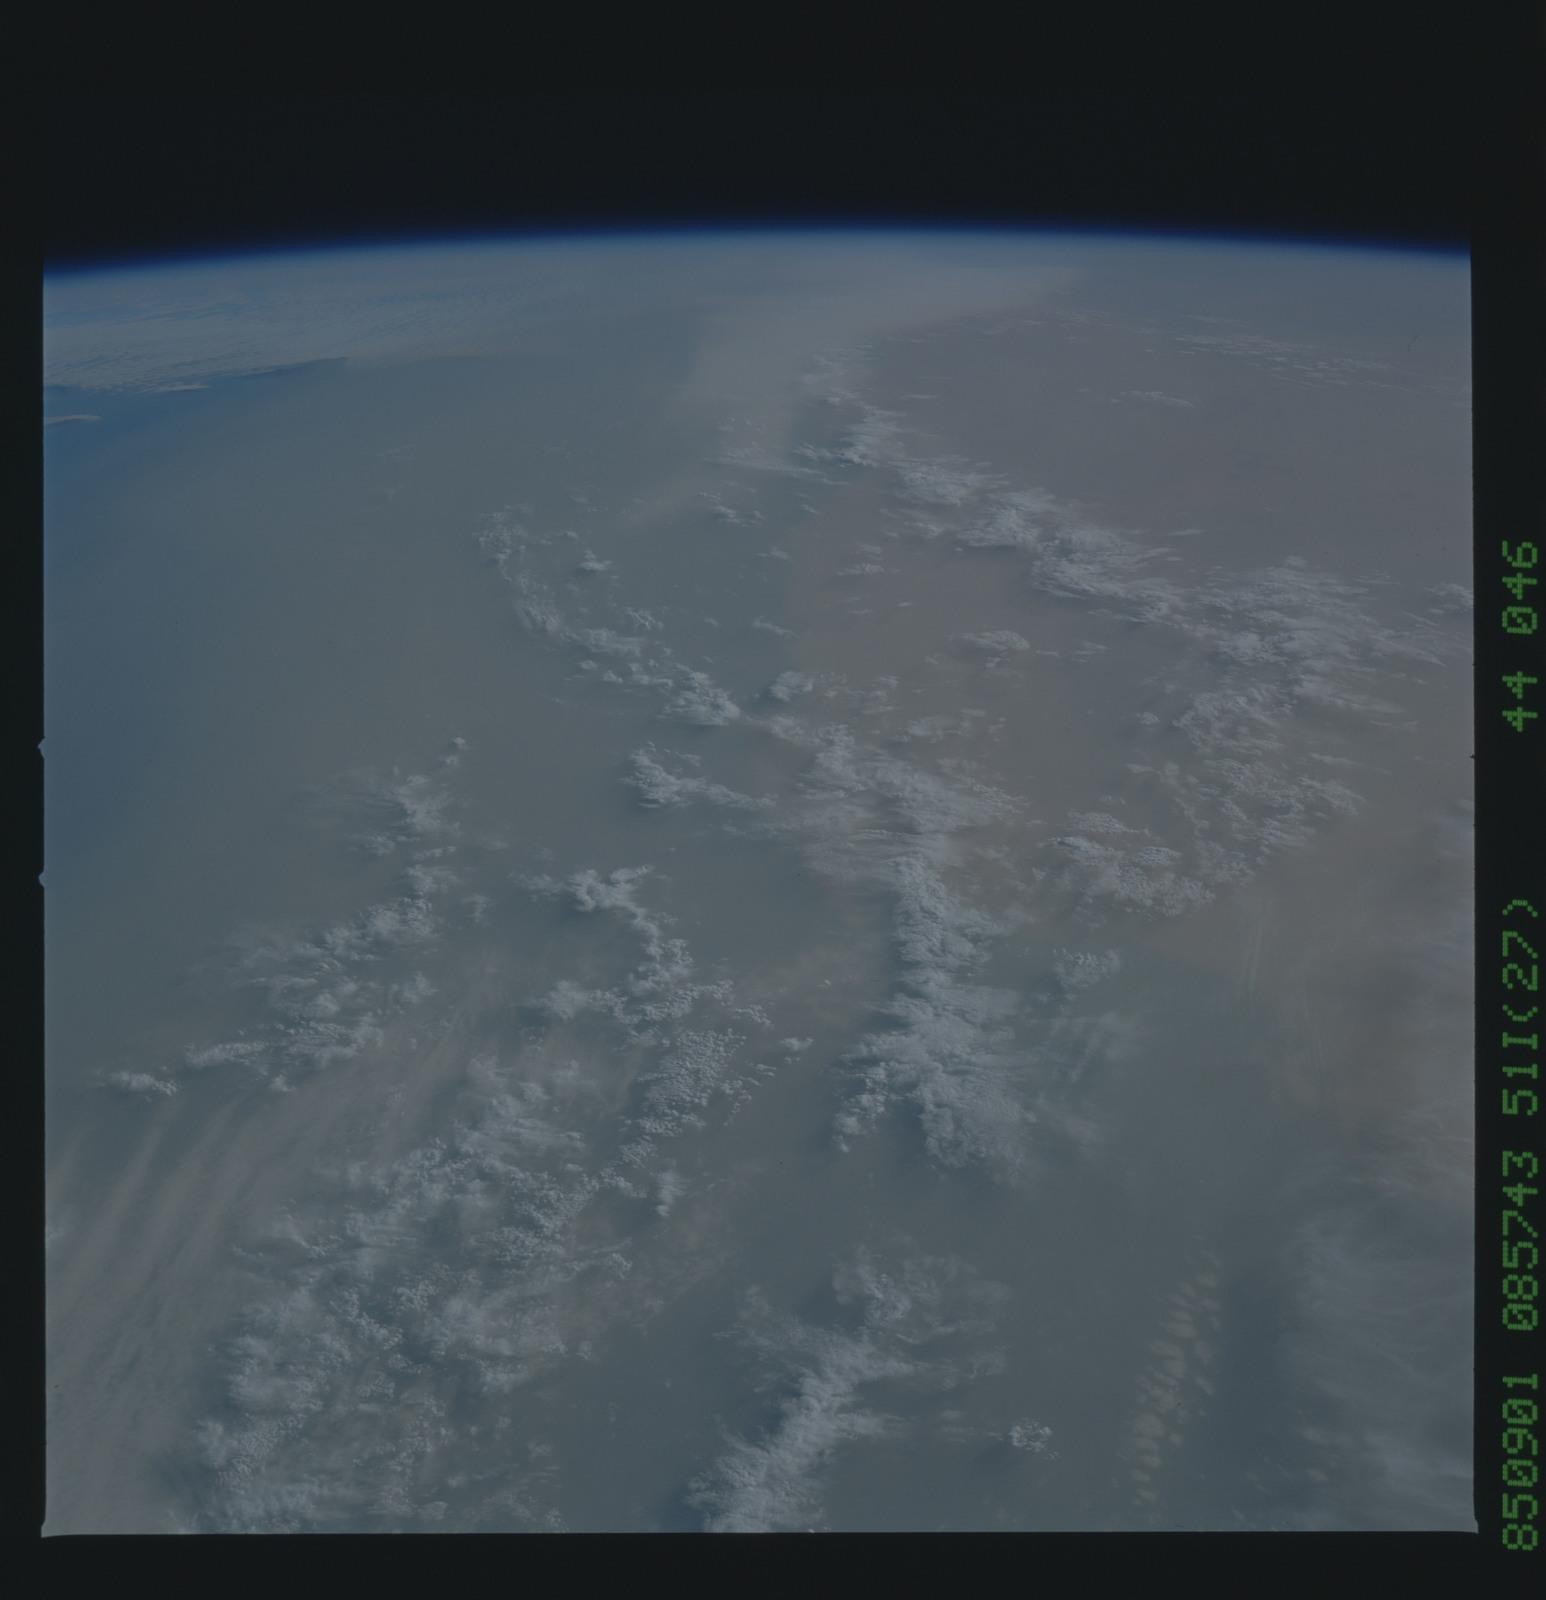 51I-44-046 - STS-51I - STS-51I earth observations